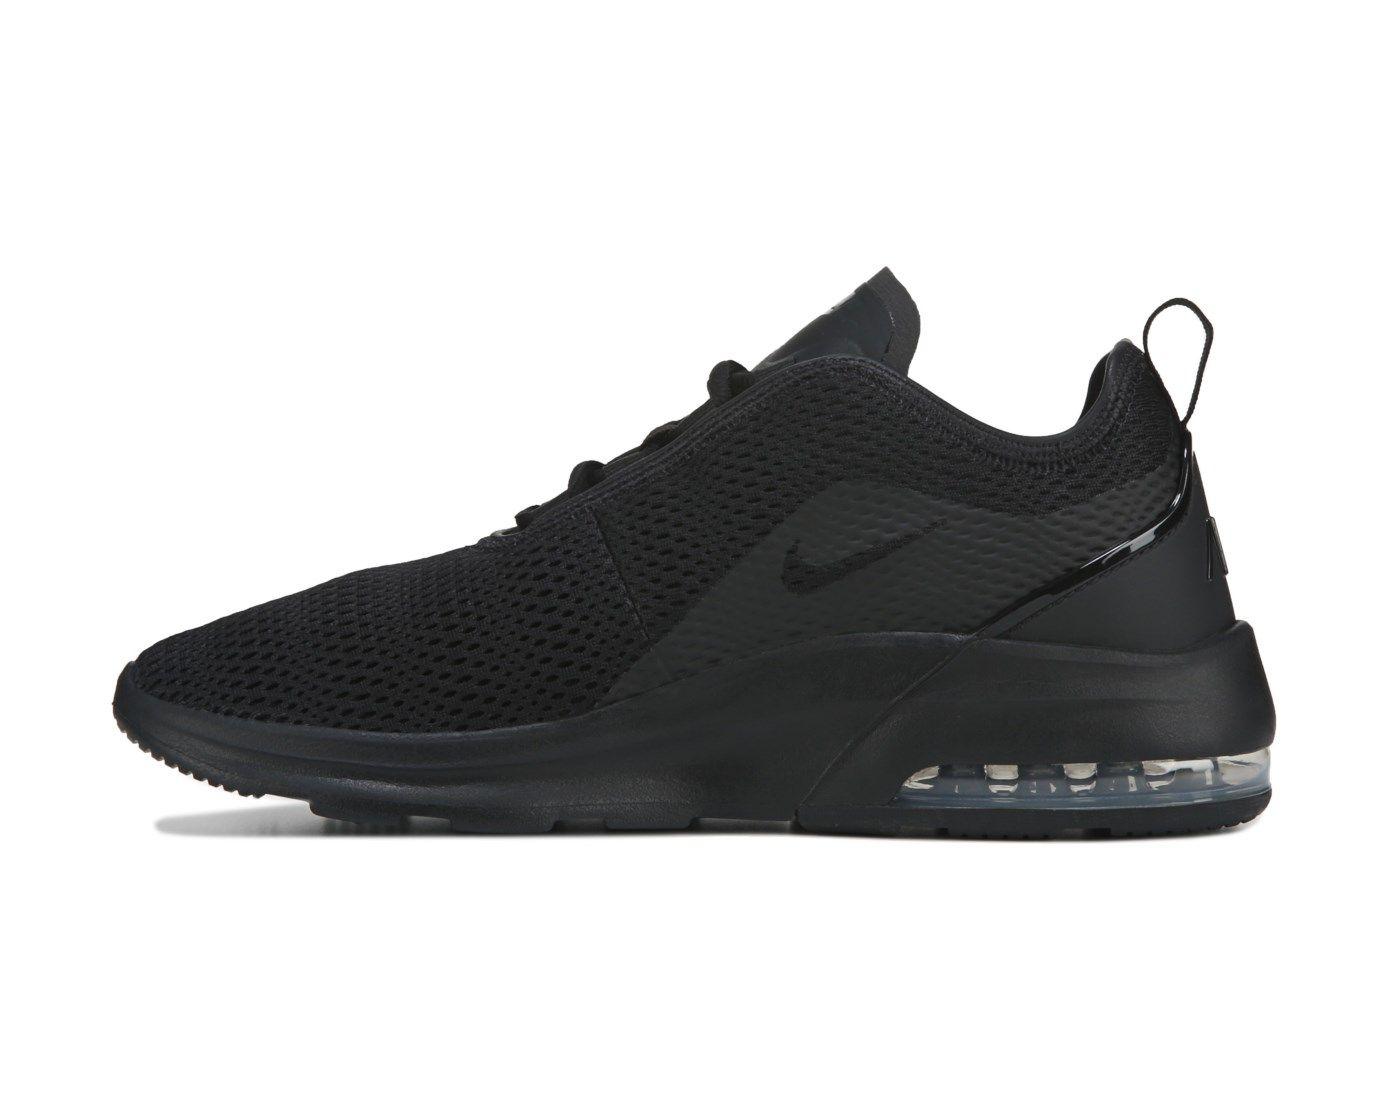 Nike Air Max Motion 2 Sneaker Black in